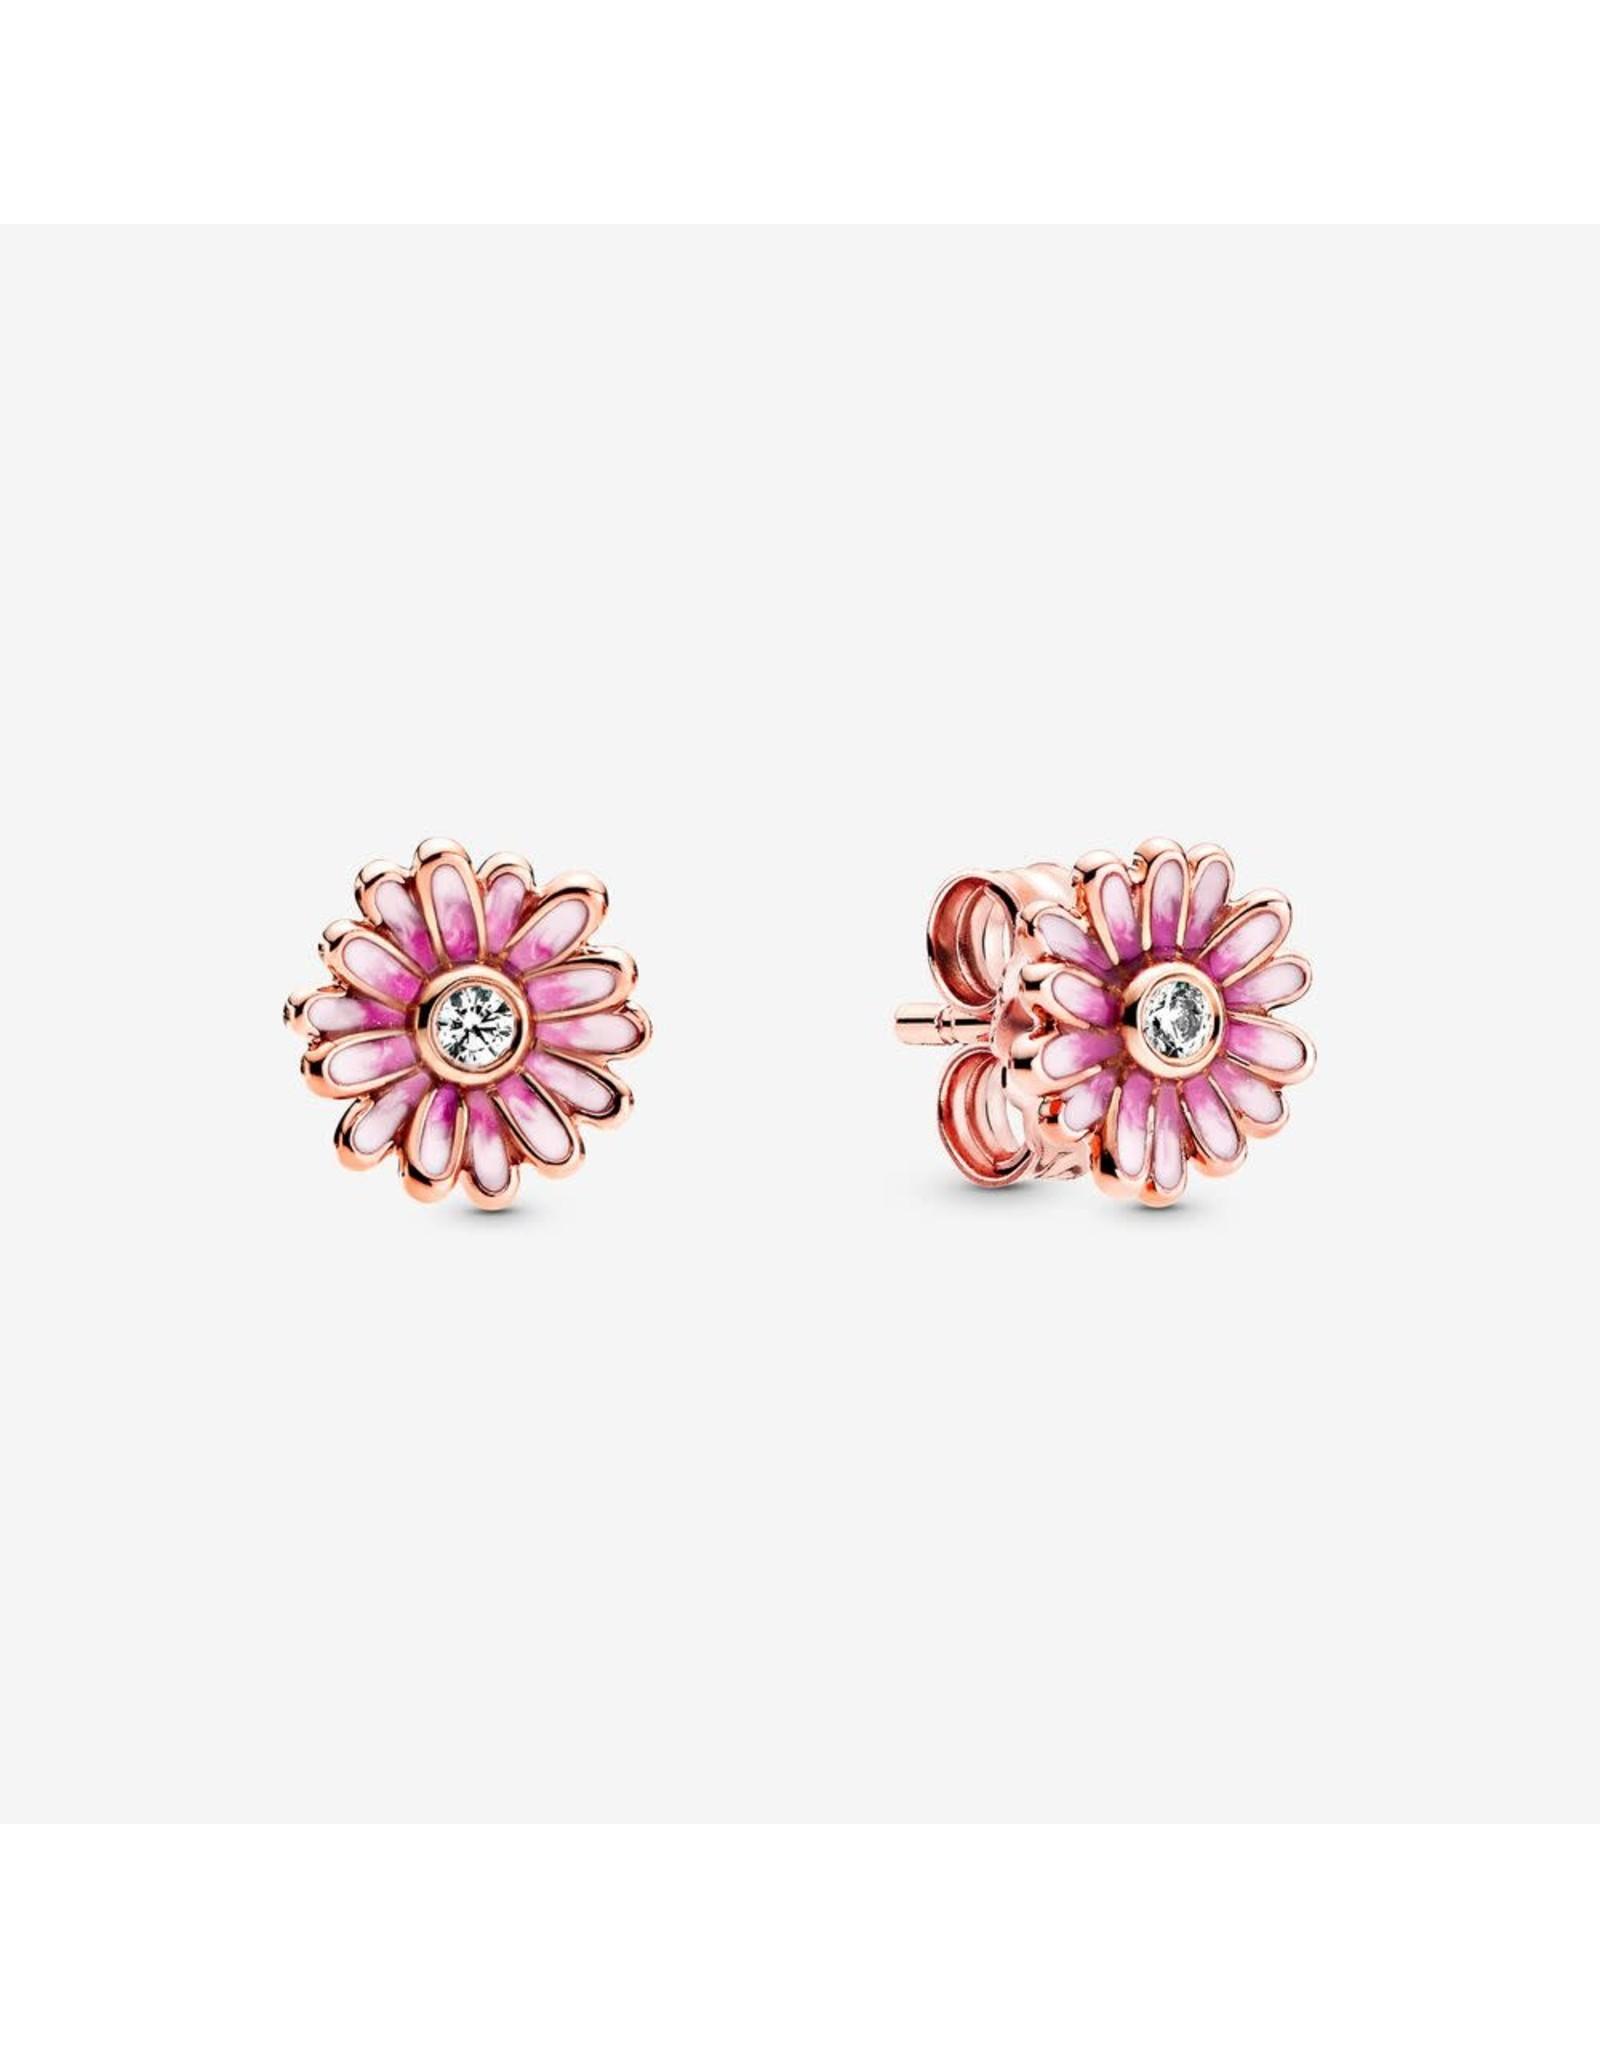 Pandora Pandora Earrings 288773C01, Daisy Rose Stud Clear CZ And Shaded Pink Enamel